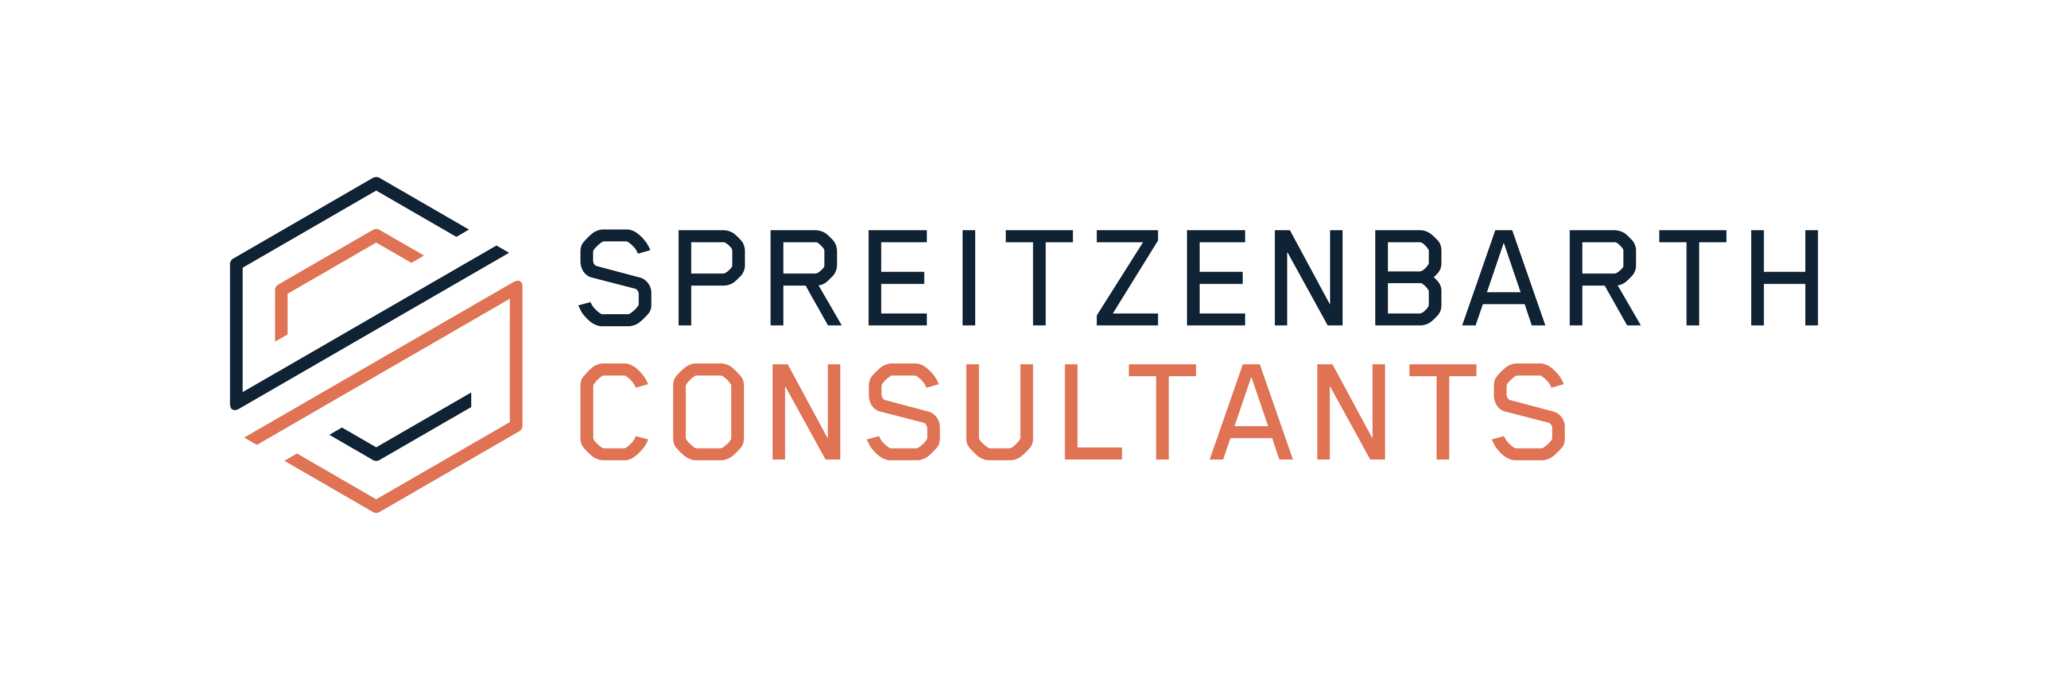 logo spreitzenbarth consultants